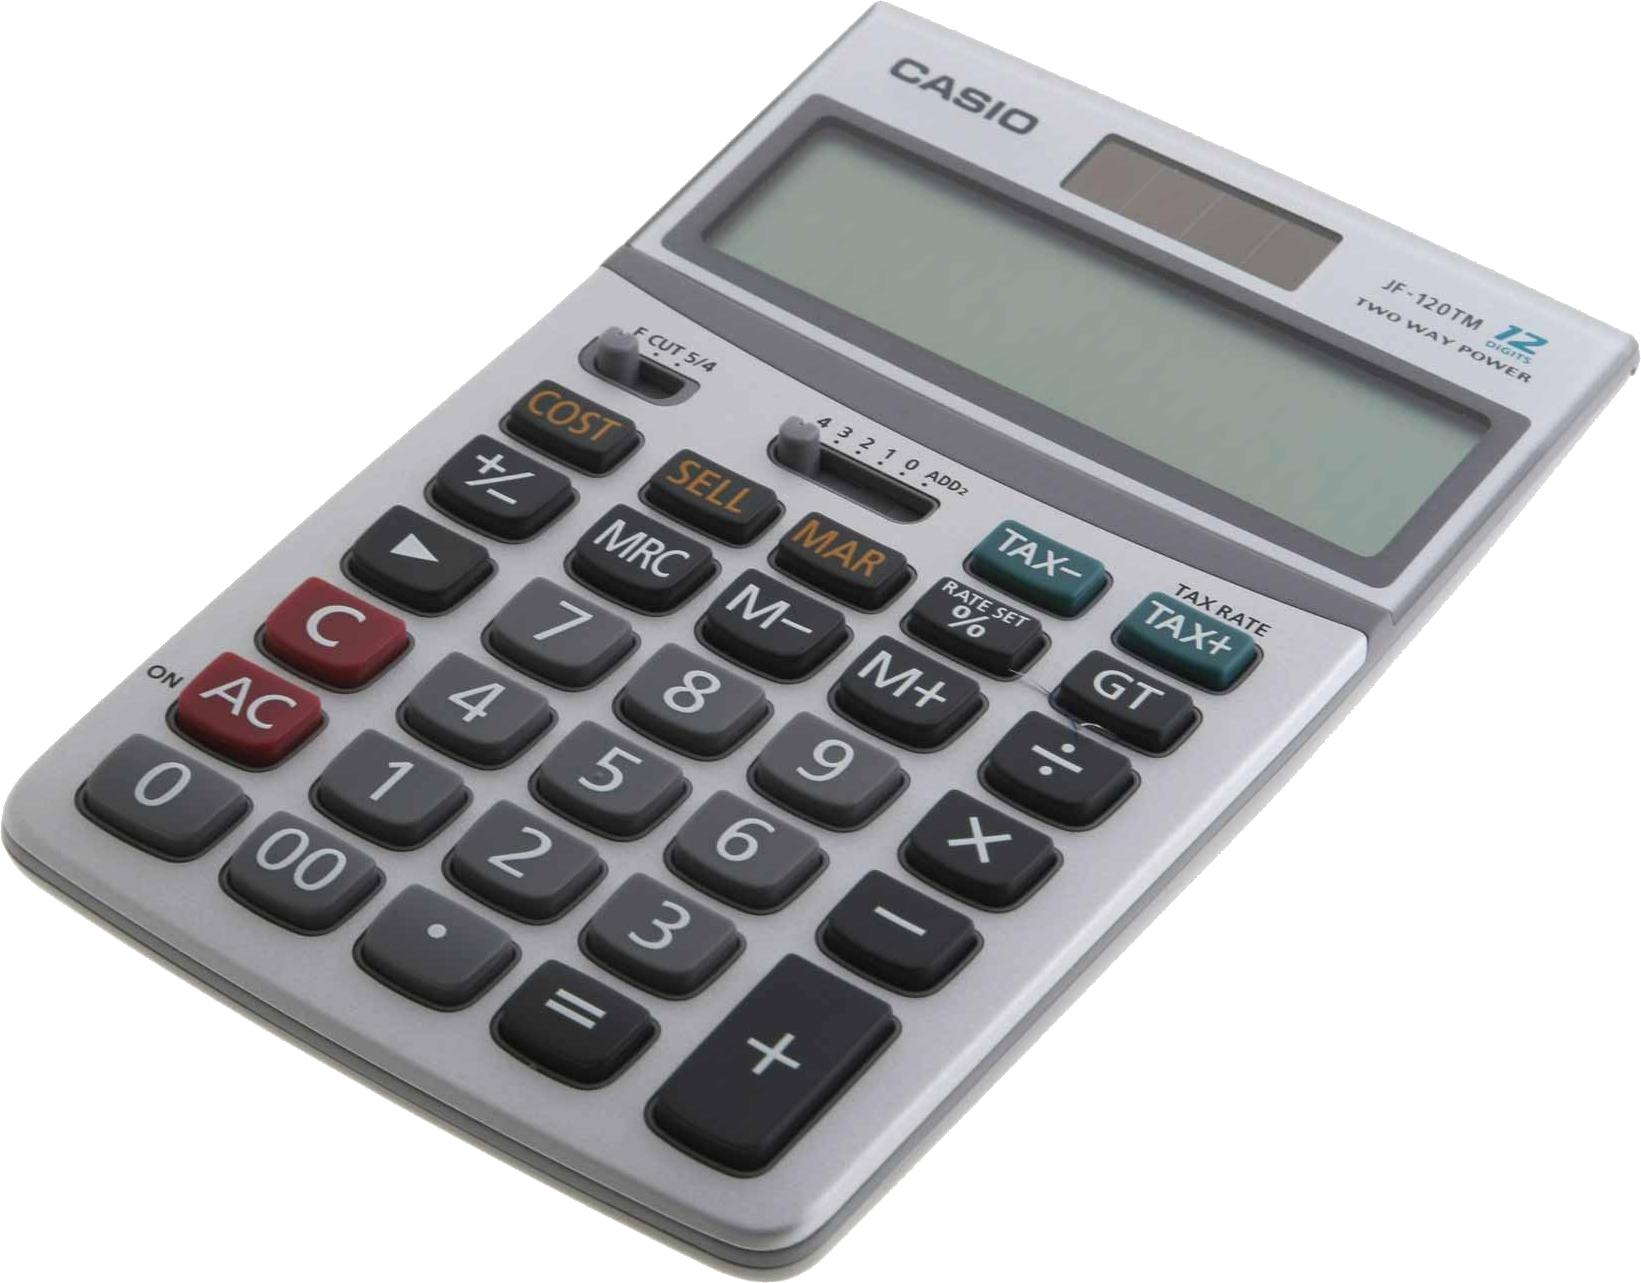 Calculator clipart transparent background. Math png image purepng